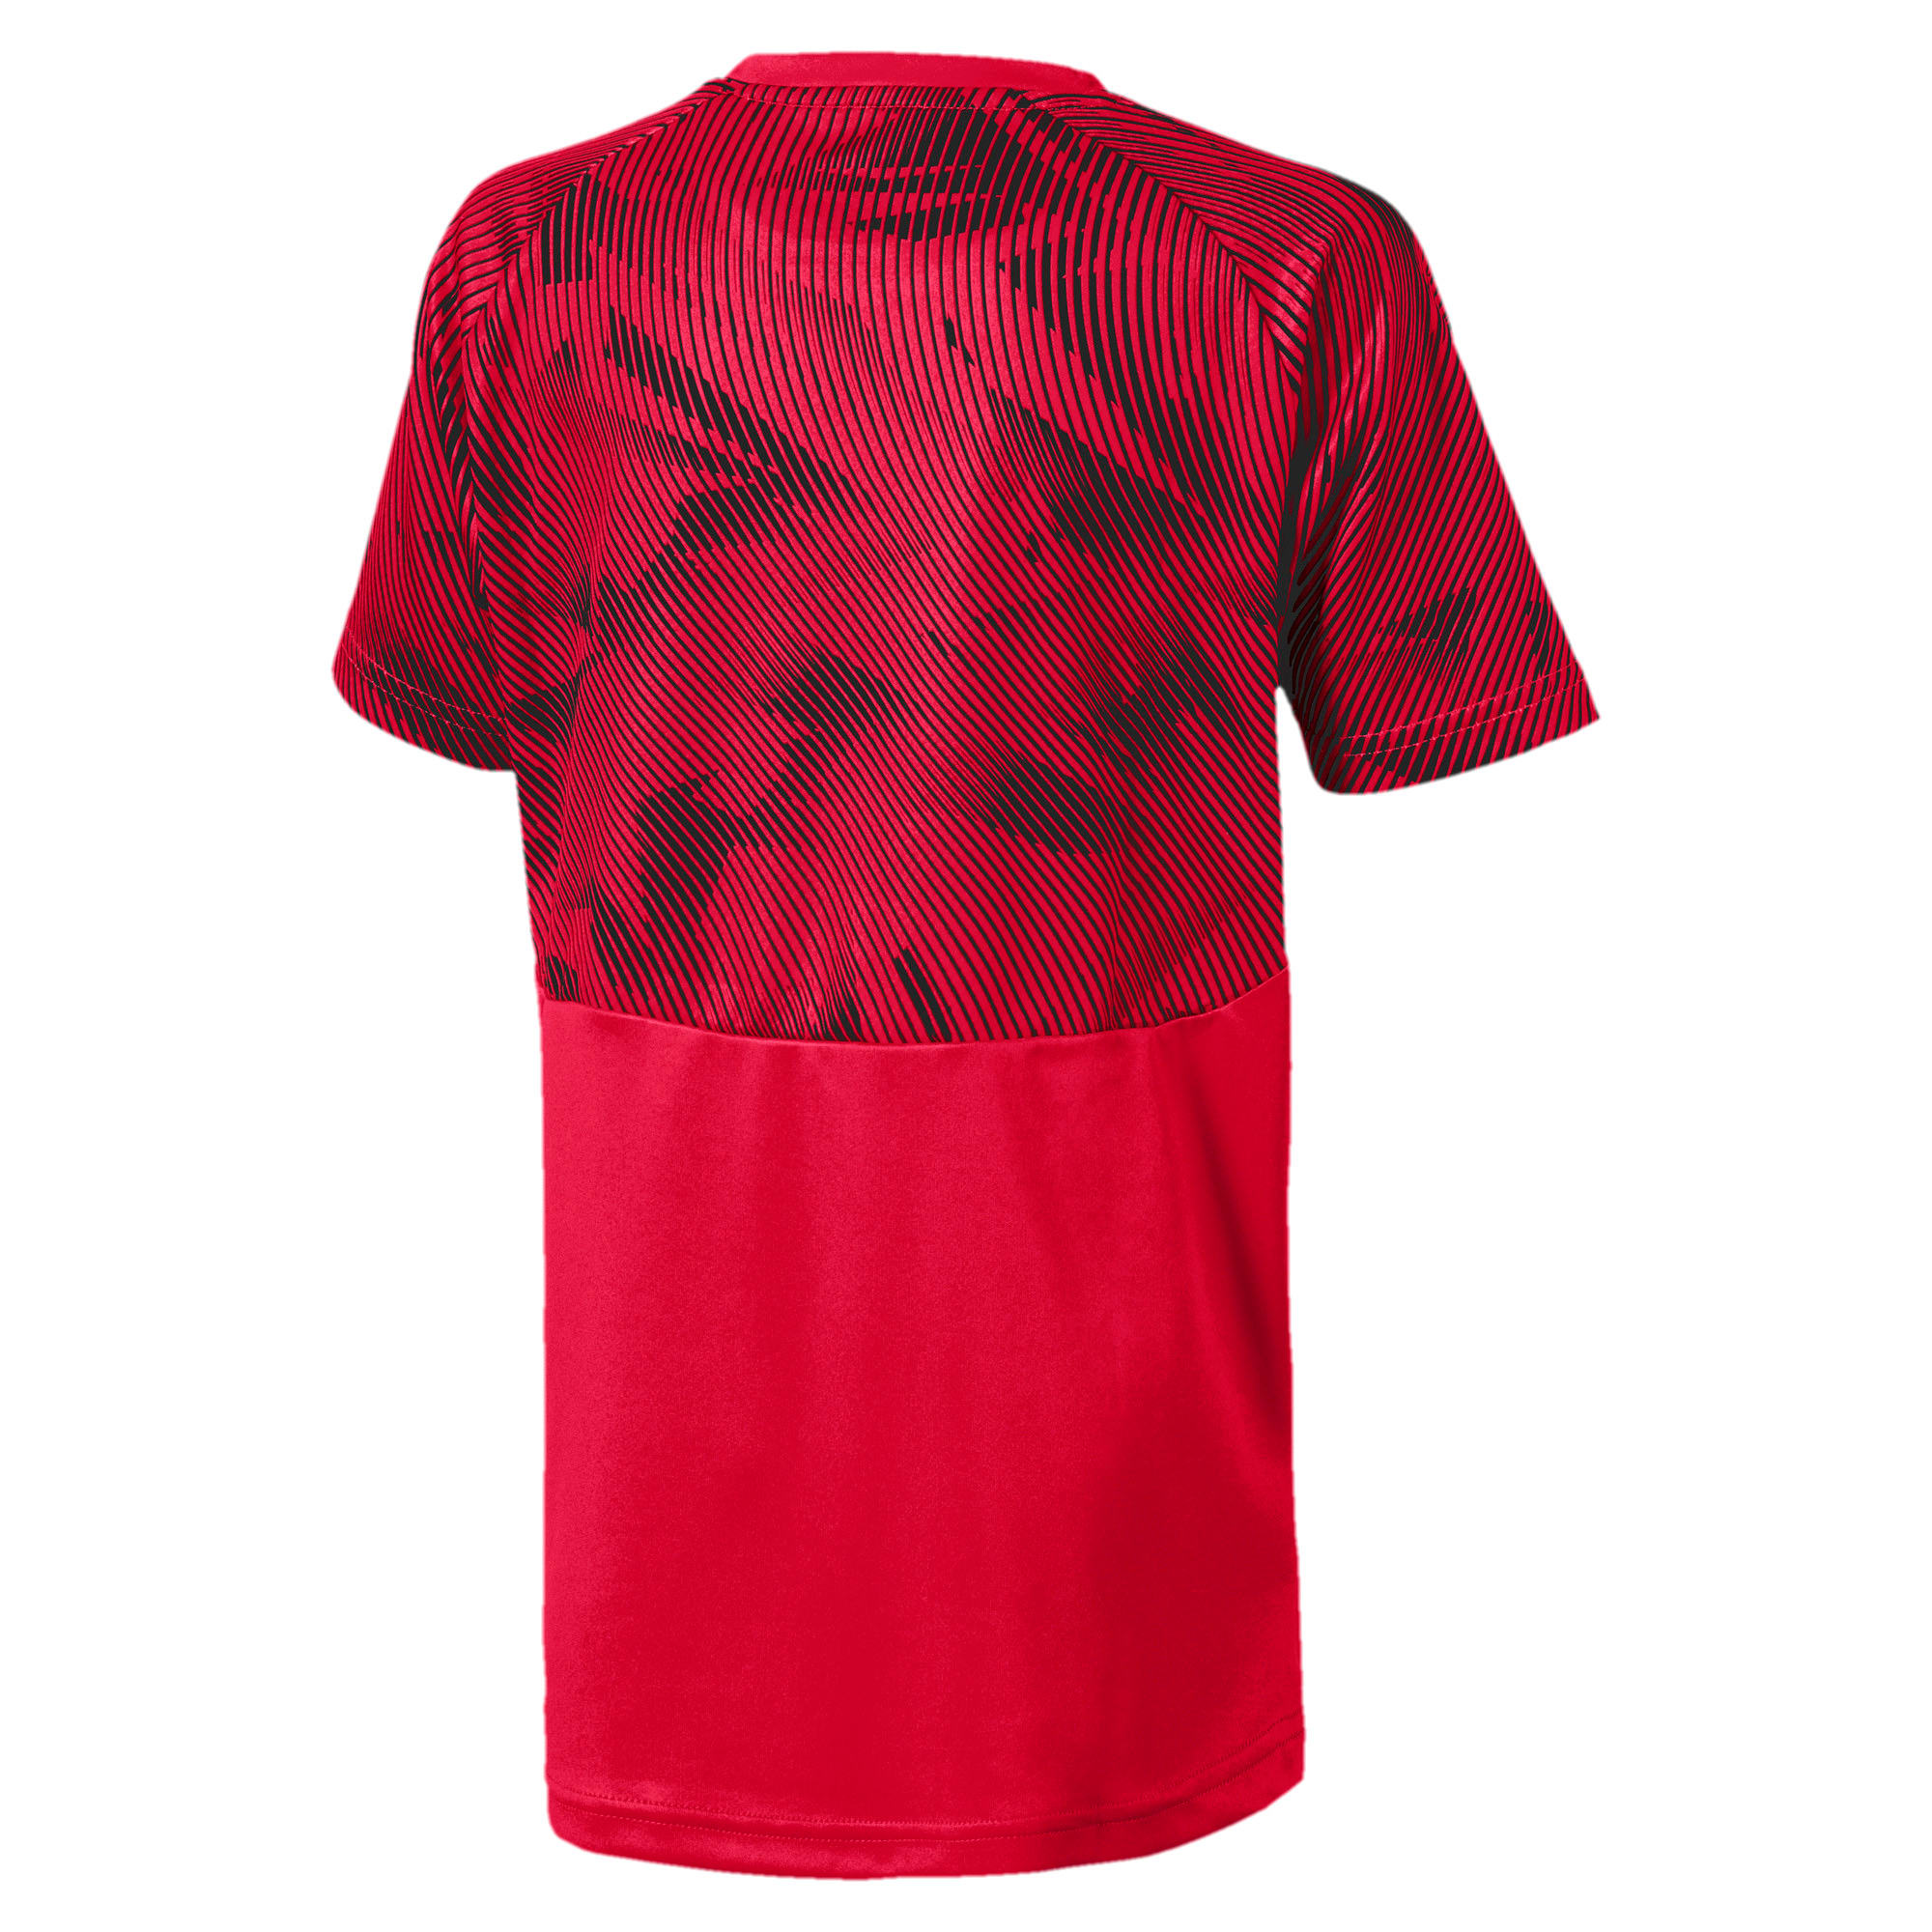 Miniatura 2 de Camiseta deportivaAC Milan para niño joven, Tango Red -Puma Black, mediano